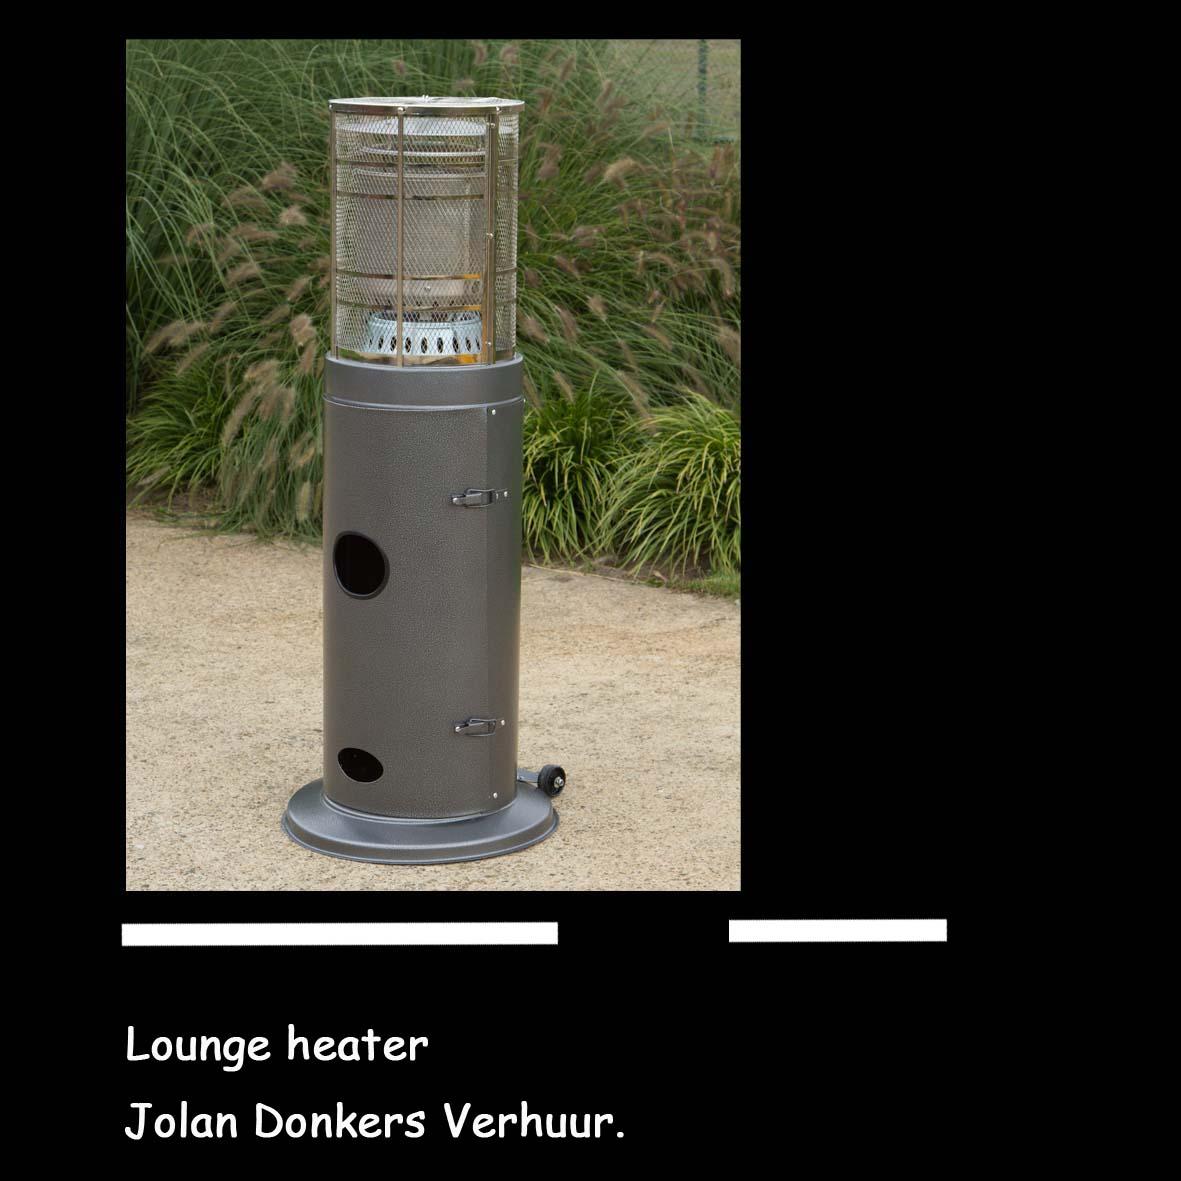 Lounge heater 2